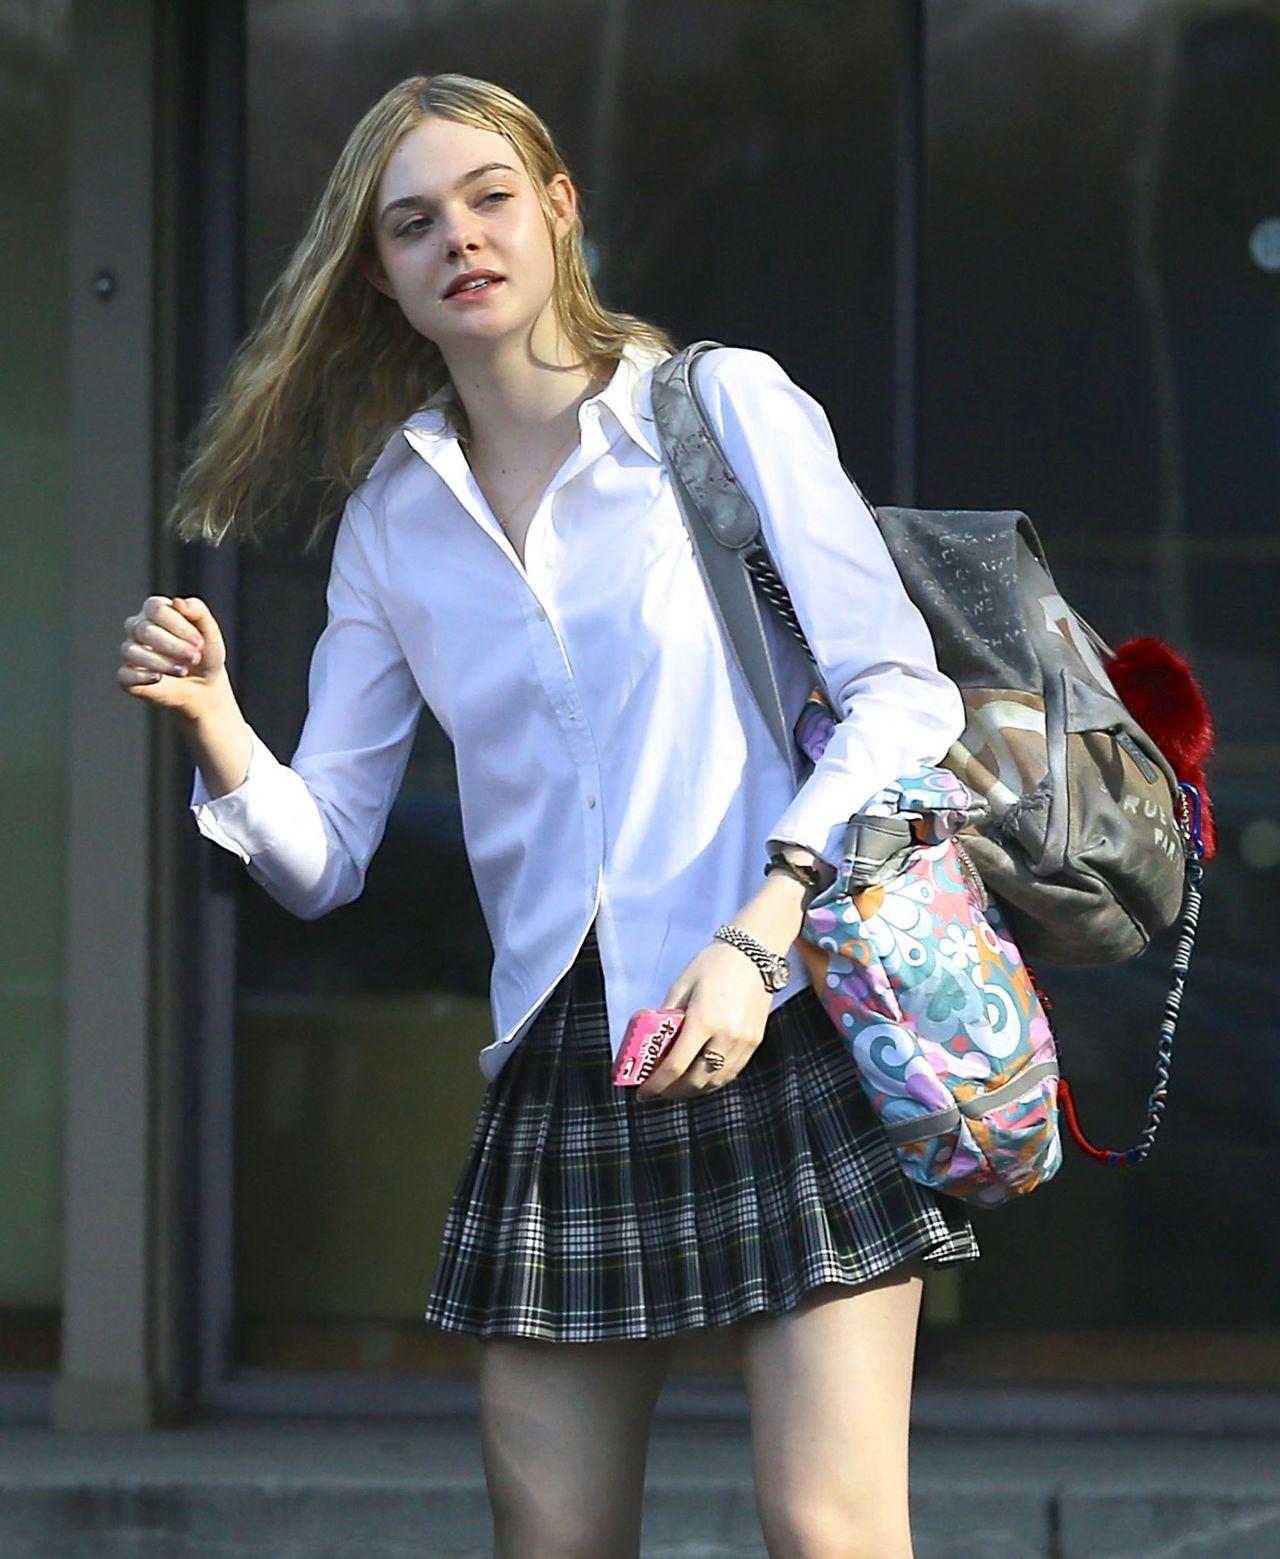 Elle Fanning Leggy In Mini Skirt Out In Los Angeles Feb